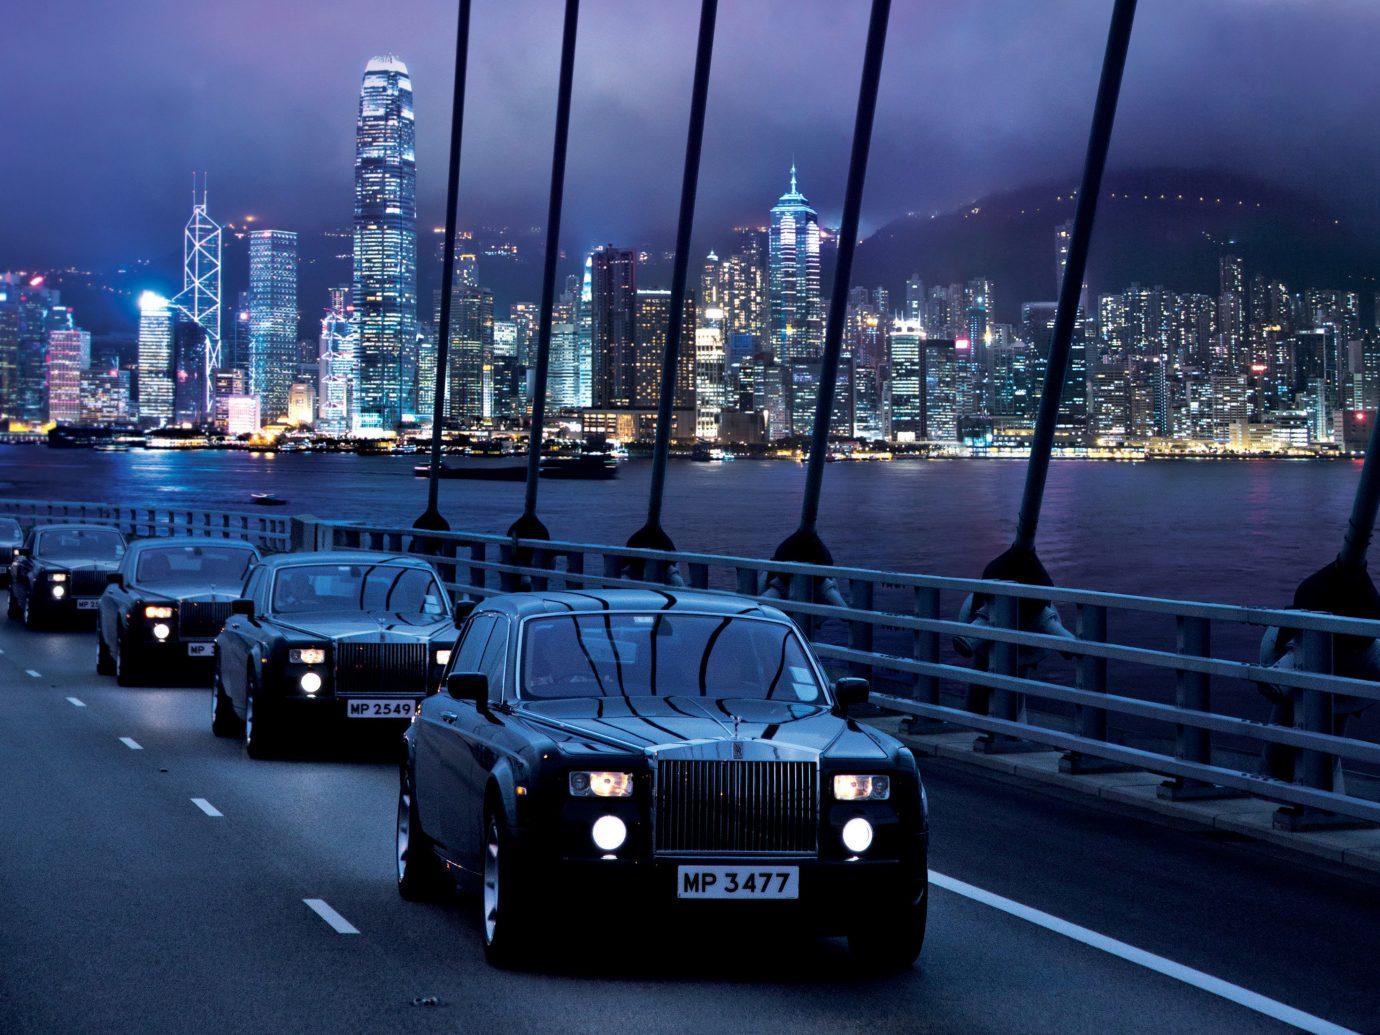 Offbeat sky outdoor road car vehicle land vehicle luxury vehicle City night cityscape highway